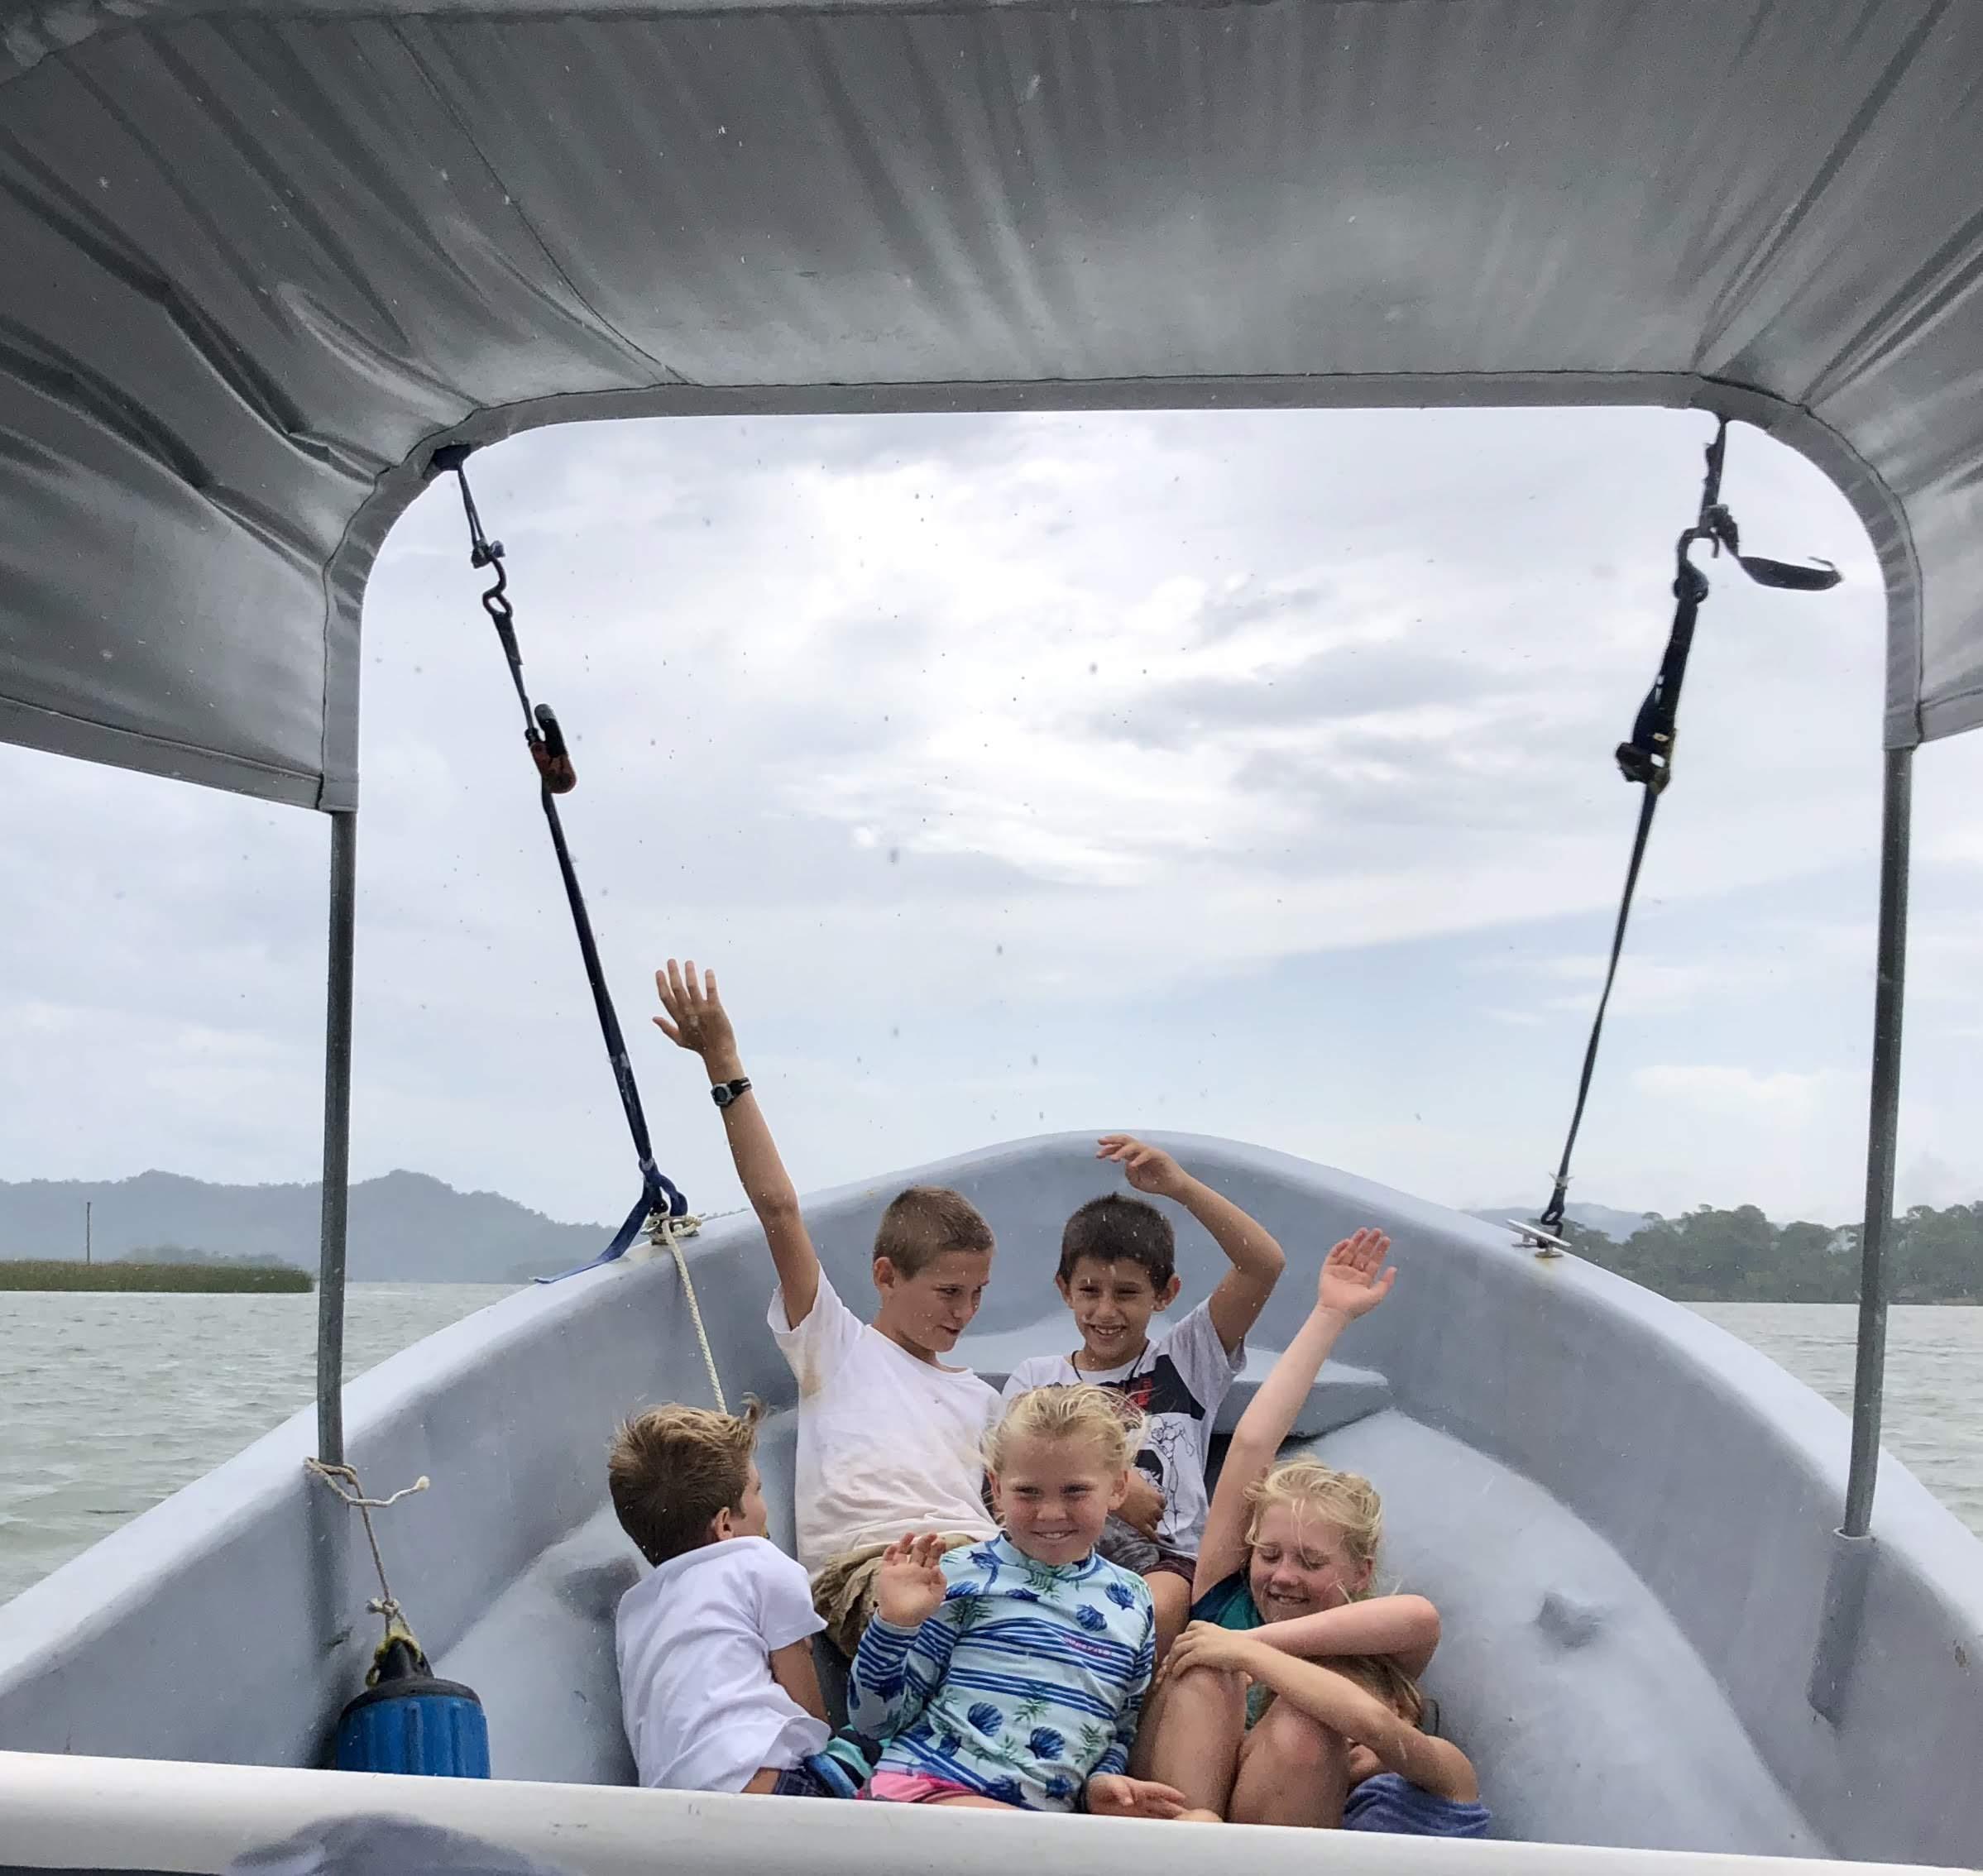 lancha boat kids